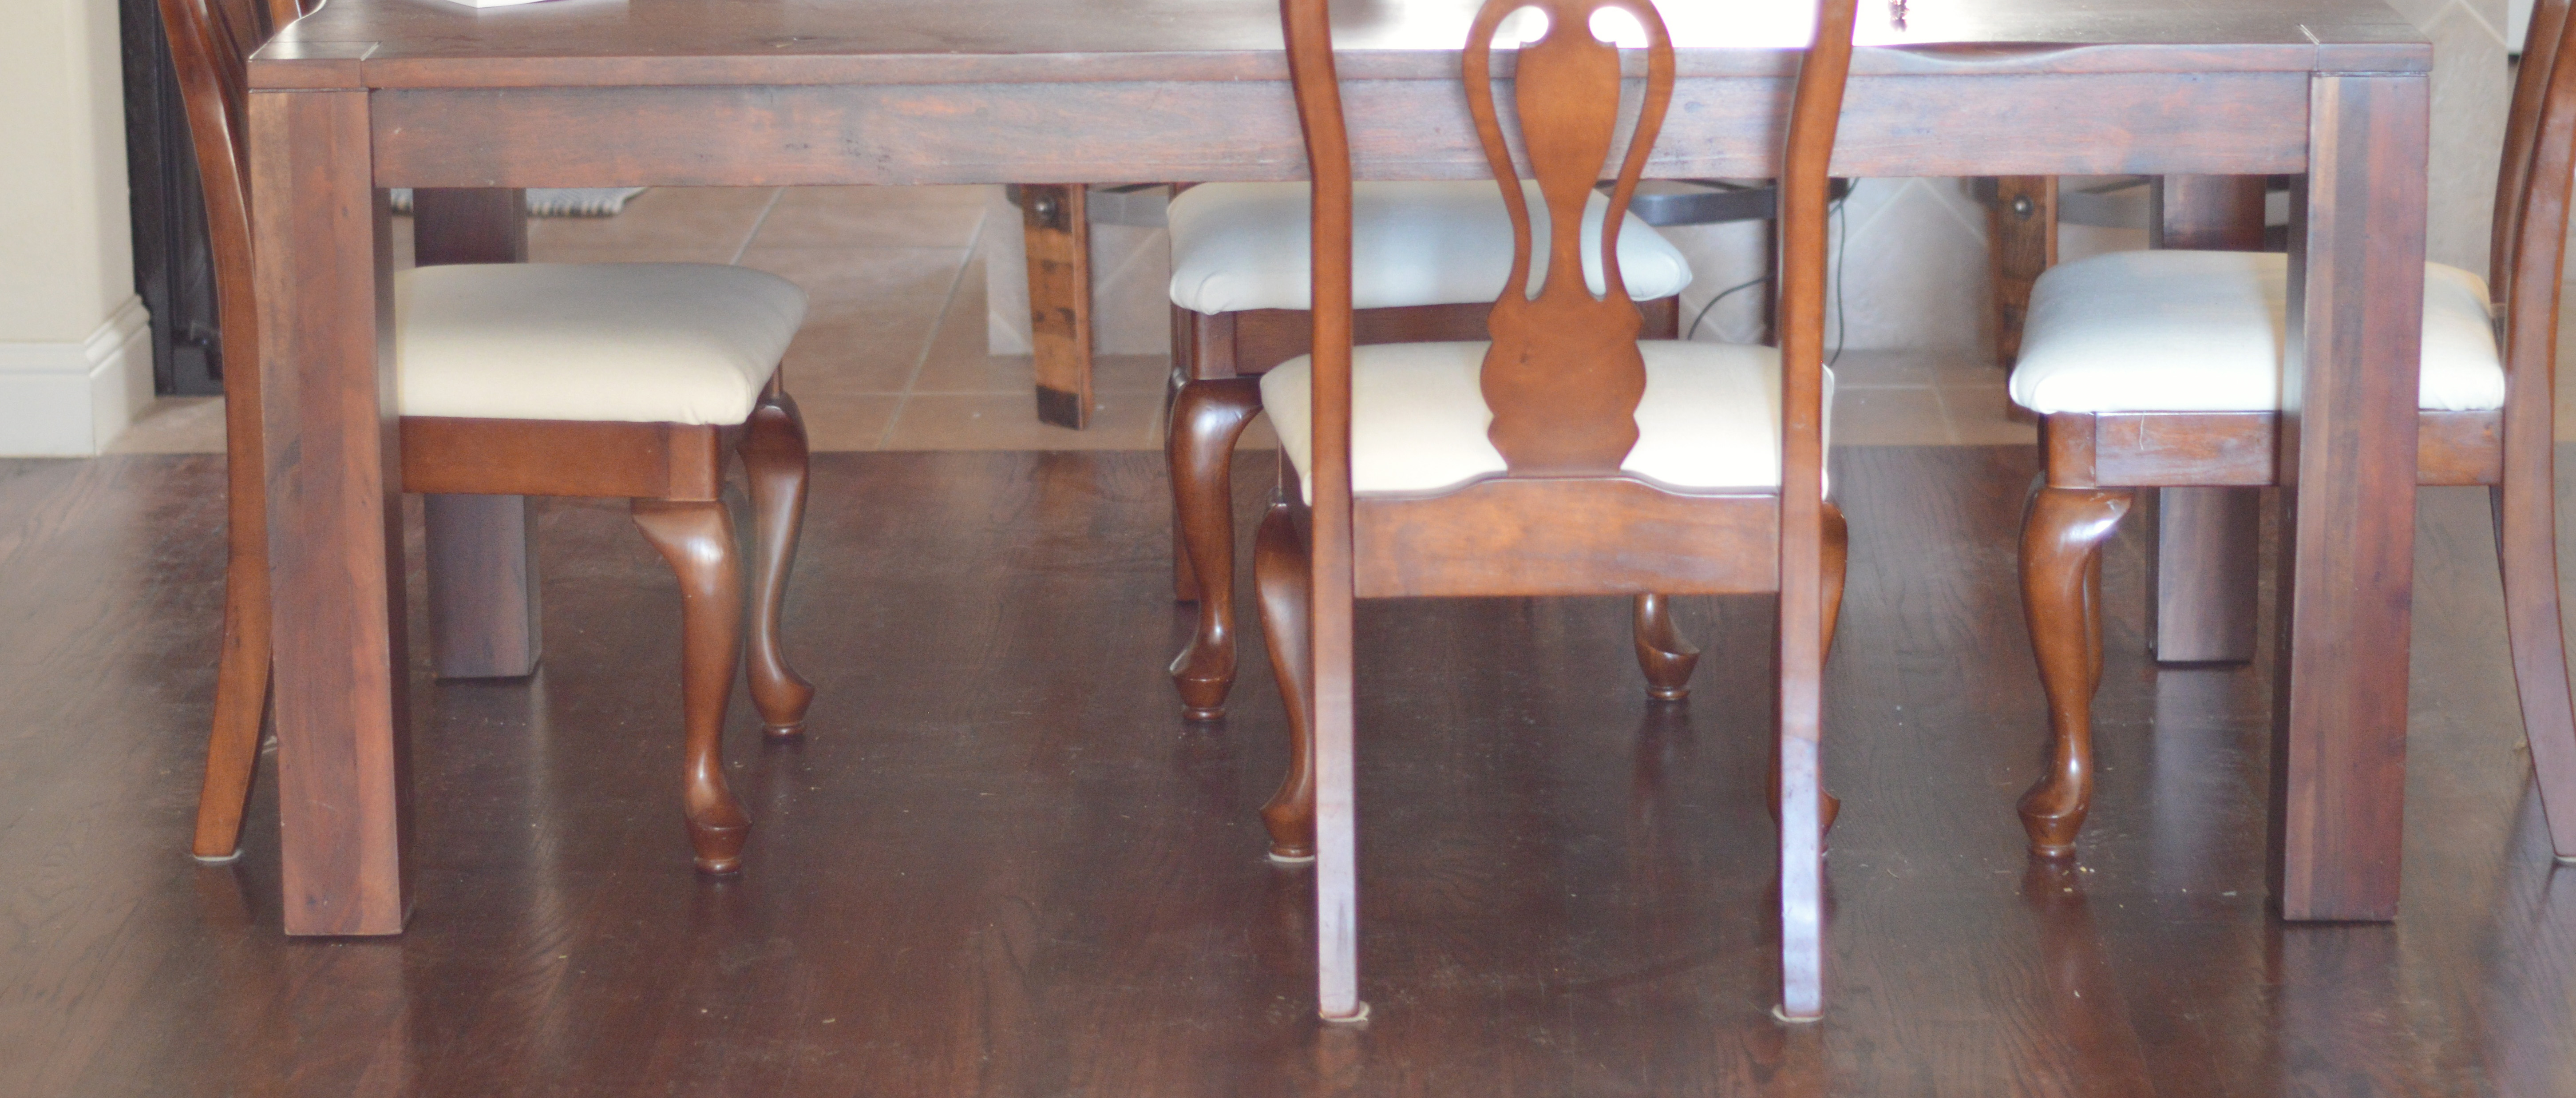 Dining Table Jute Rug Under Dining Table : 008 copy from choicediningtable.blogspot.com size 5803 x 2473 jpeg 2710kB